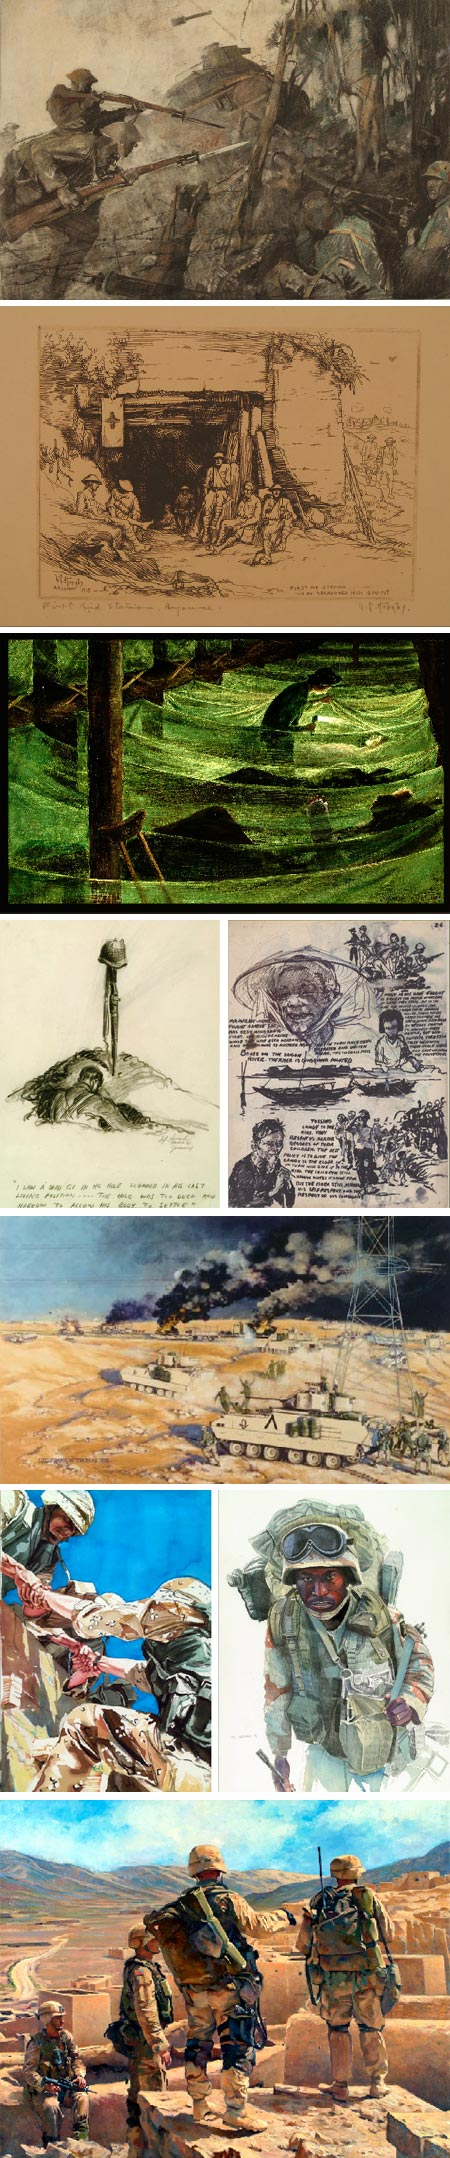 Art of the American Soldier: George Harding, Lester G. Hornby, Franklin Boggs, Howard Brodie, Paul MacWilliams, Frank M. Thomas, Sieger Hartgers, Peter G. Varisano, Elzie Golden